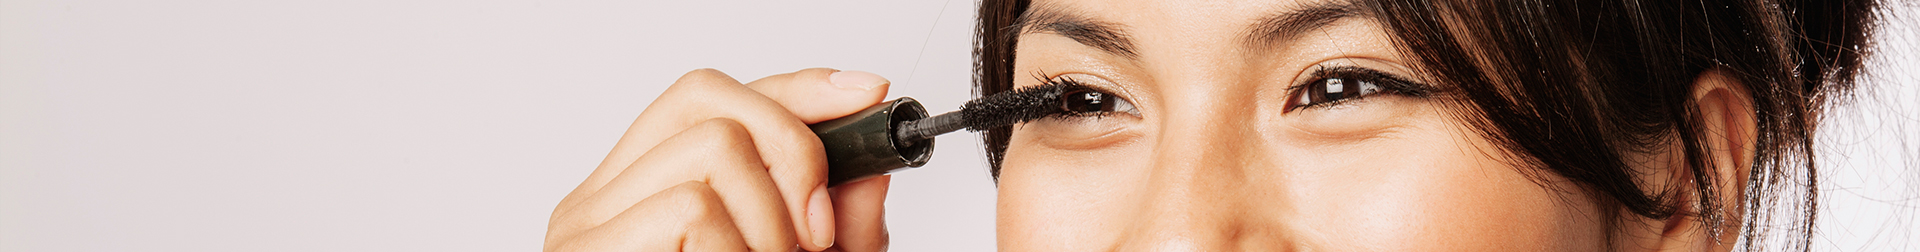 Makeup Products | Mascara - Buy Eye Mascara | AromaCraze